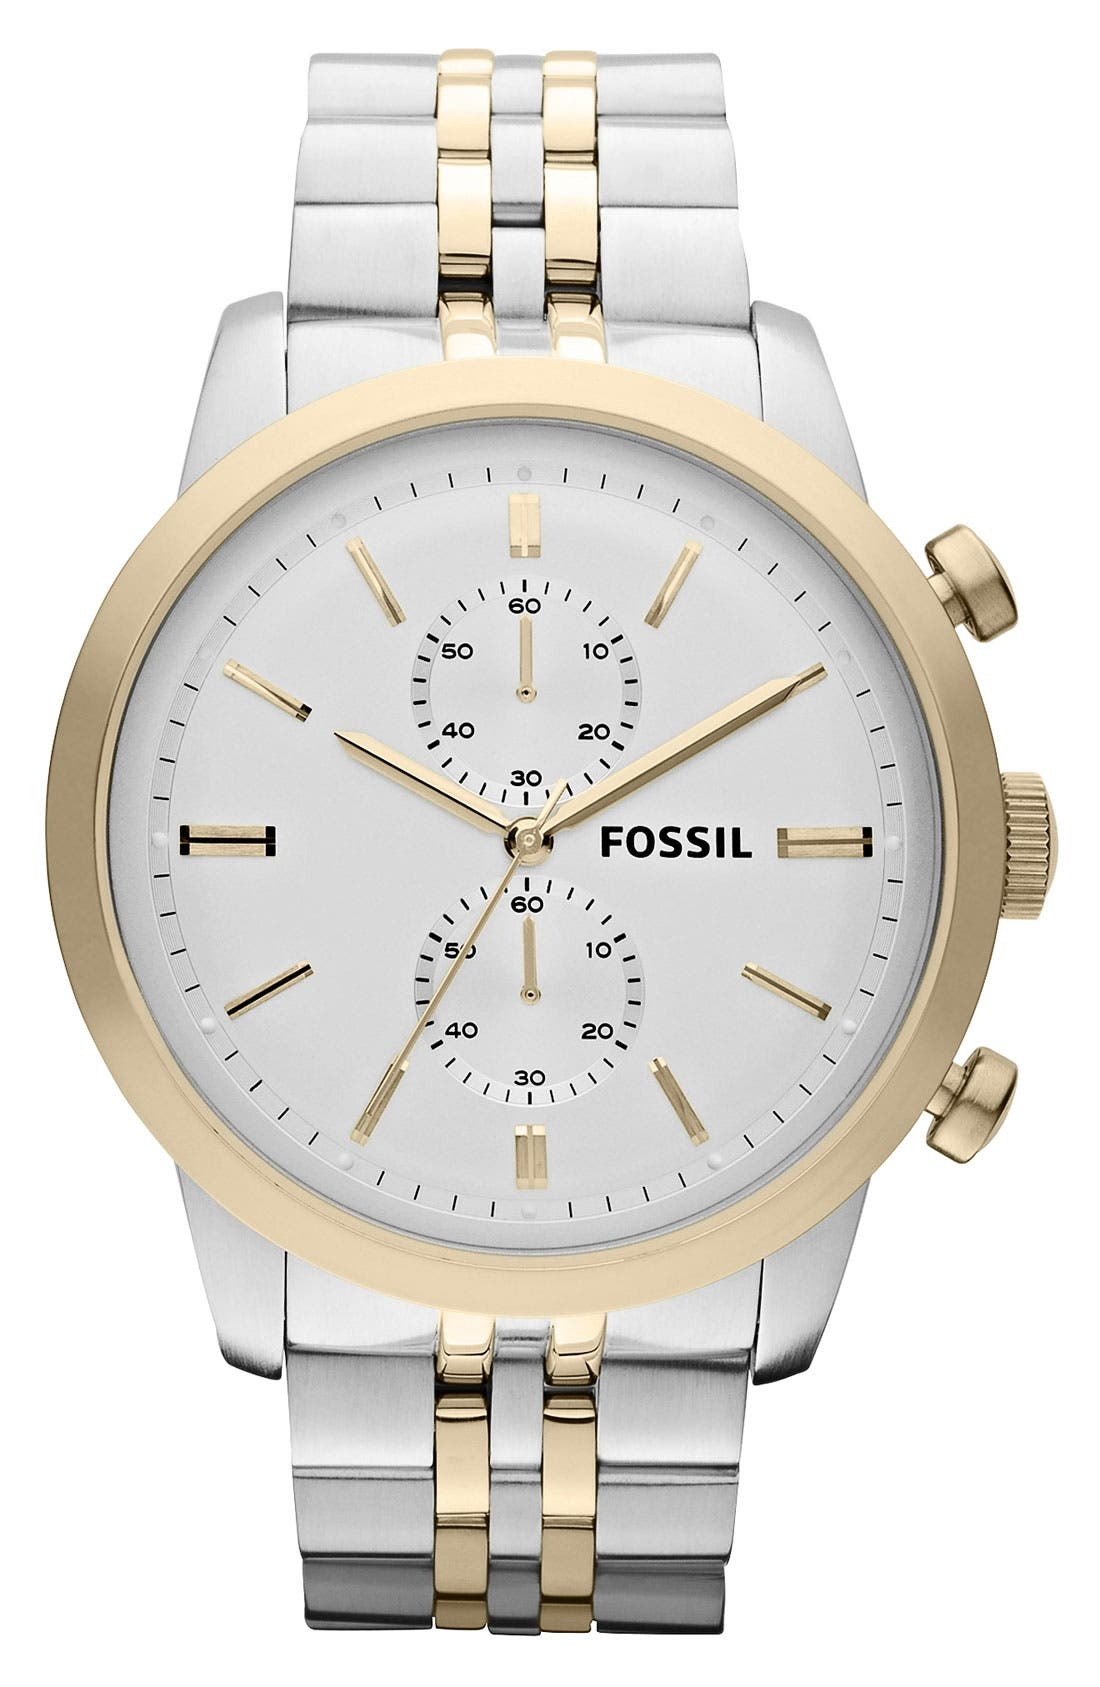 Main Image - Fossil 'Townsman' Chronograph Bracelet Watch, 48mm